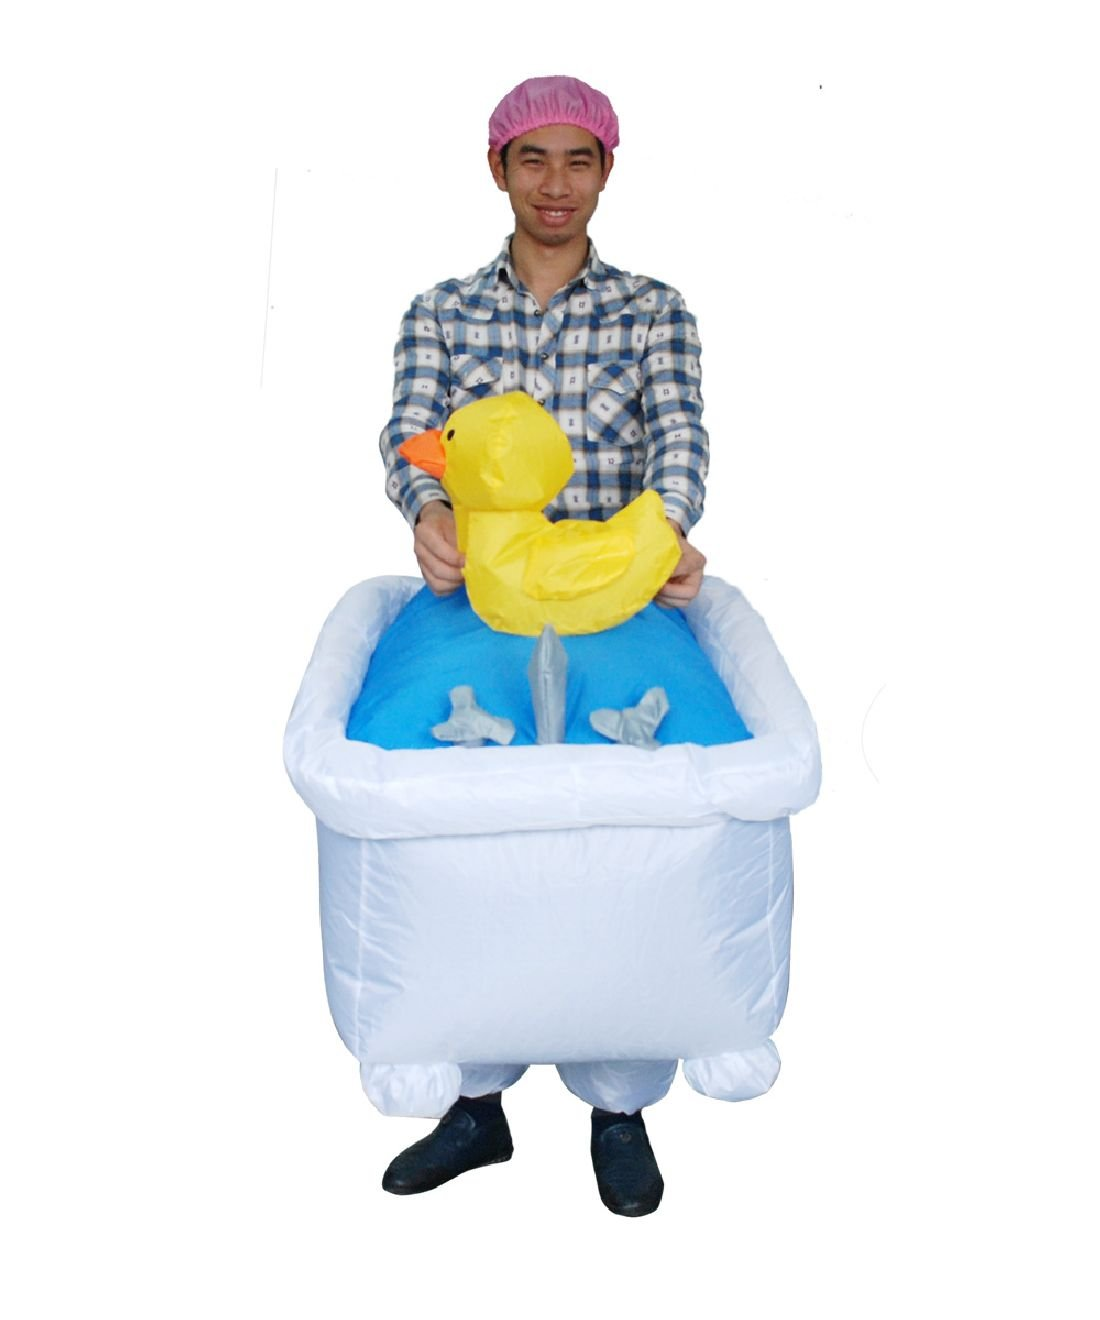 Adult Inflatable Bathtub Costume Halloween Funny Game Dress